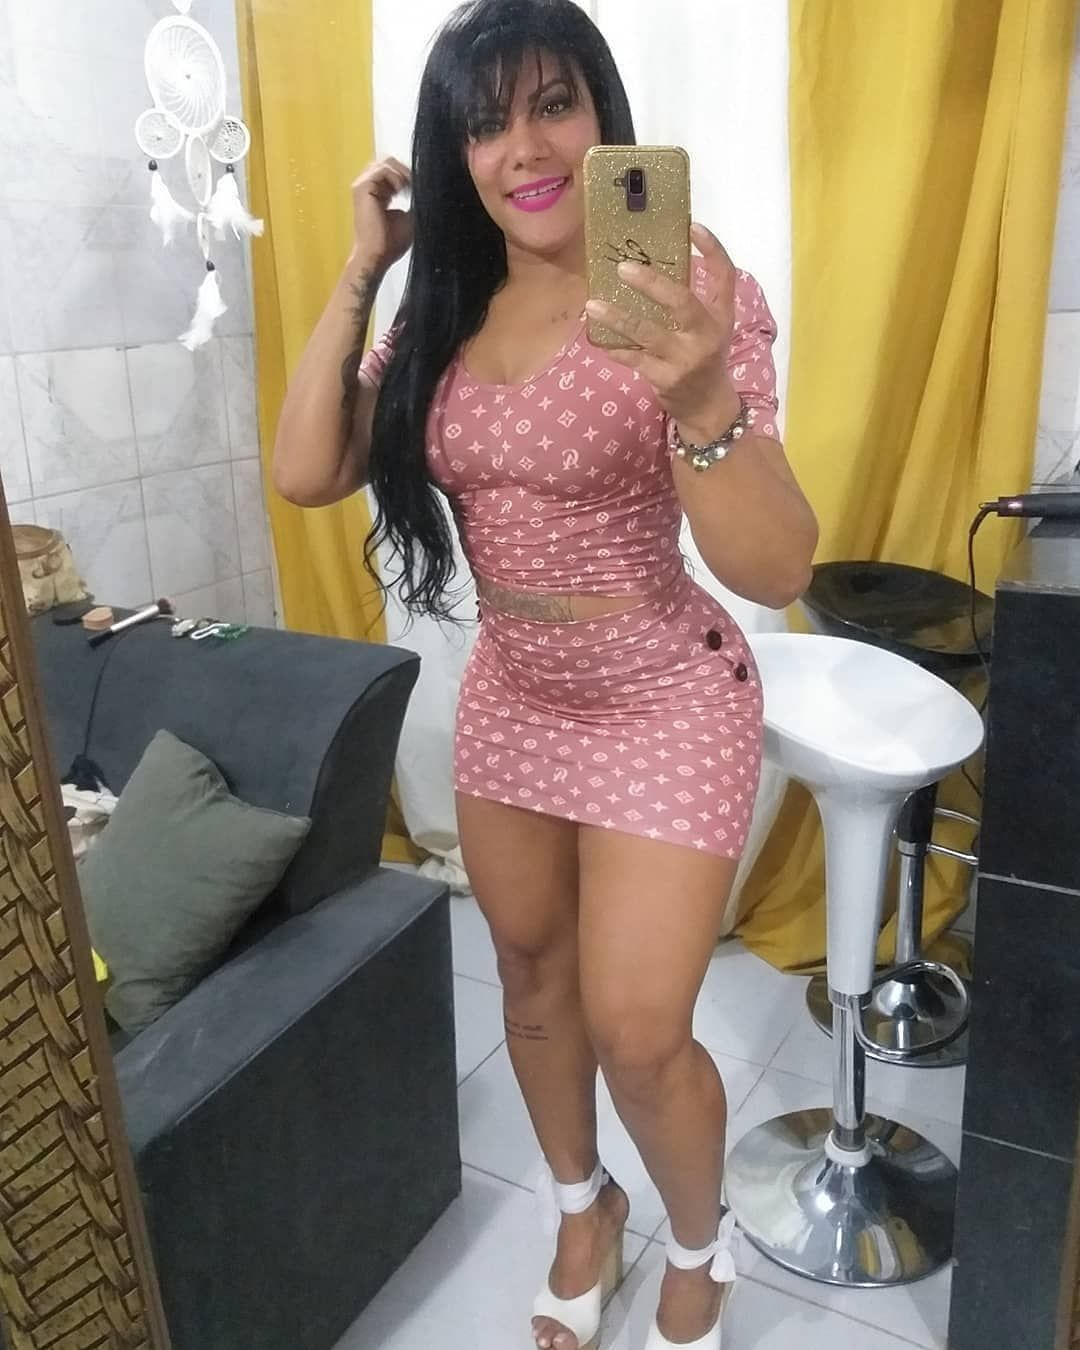 49 Sexy Girls In Sundresses - Barnorama